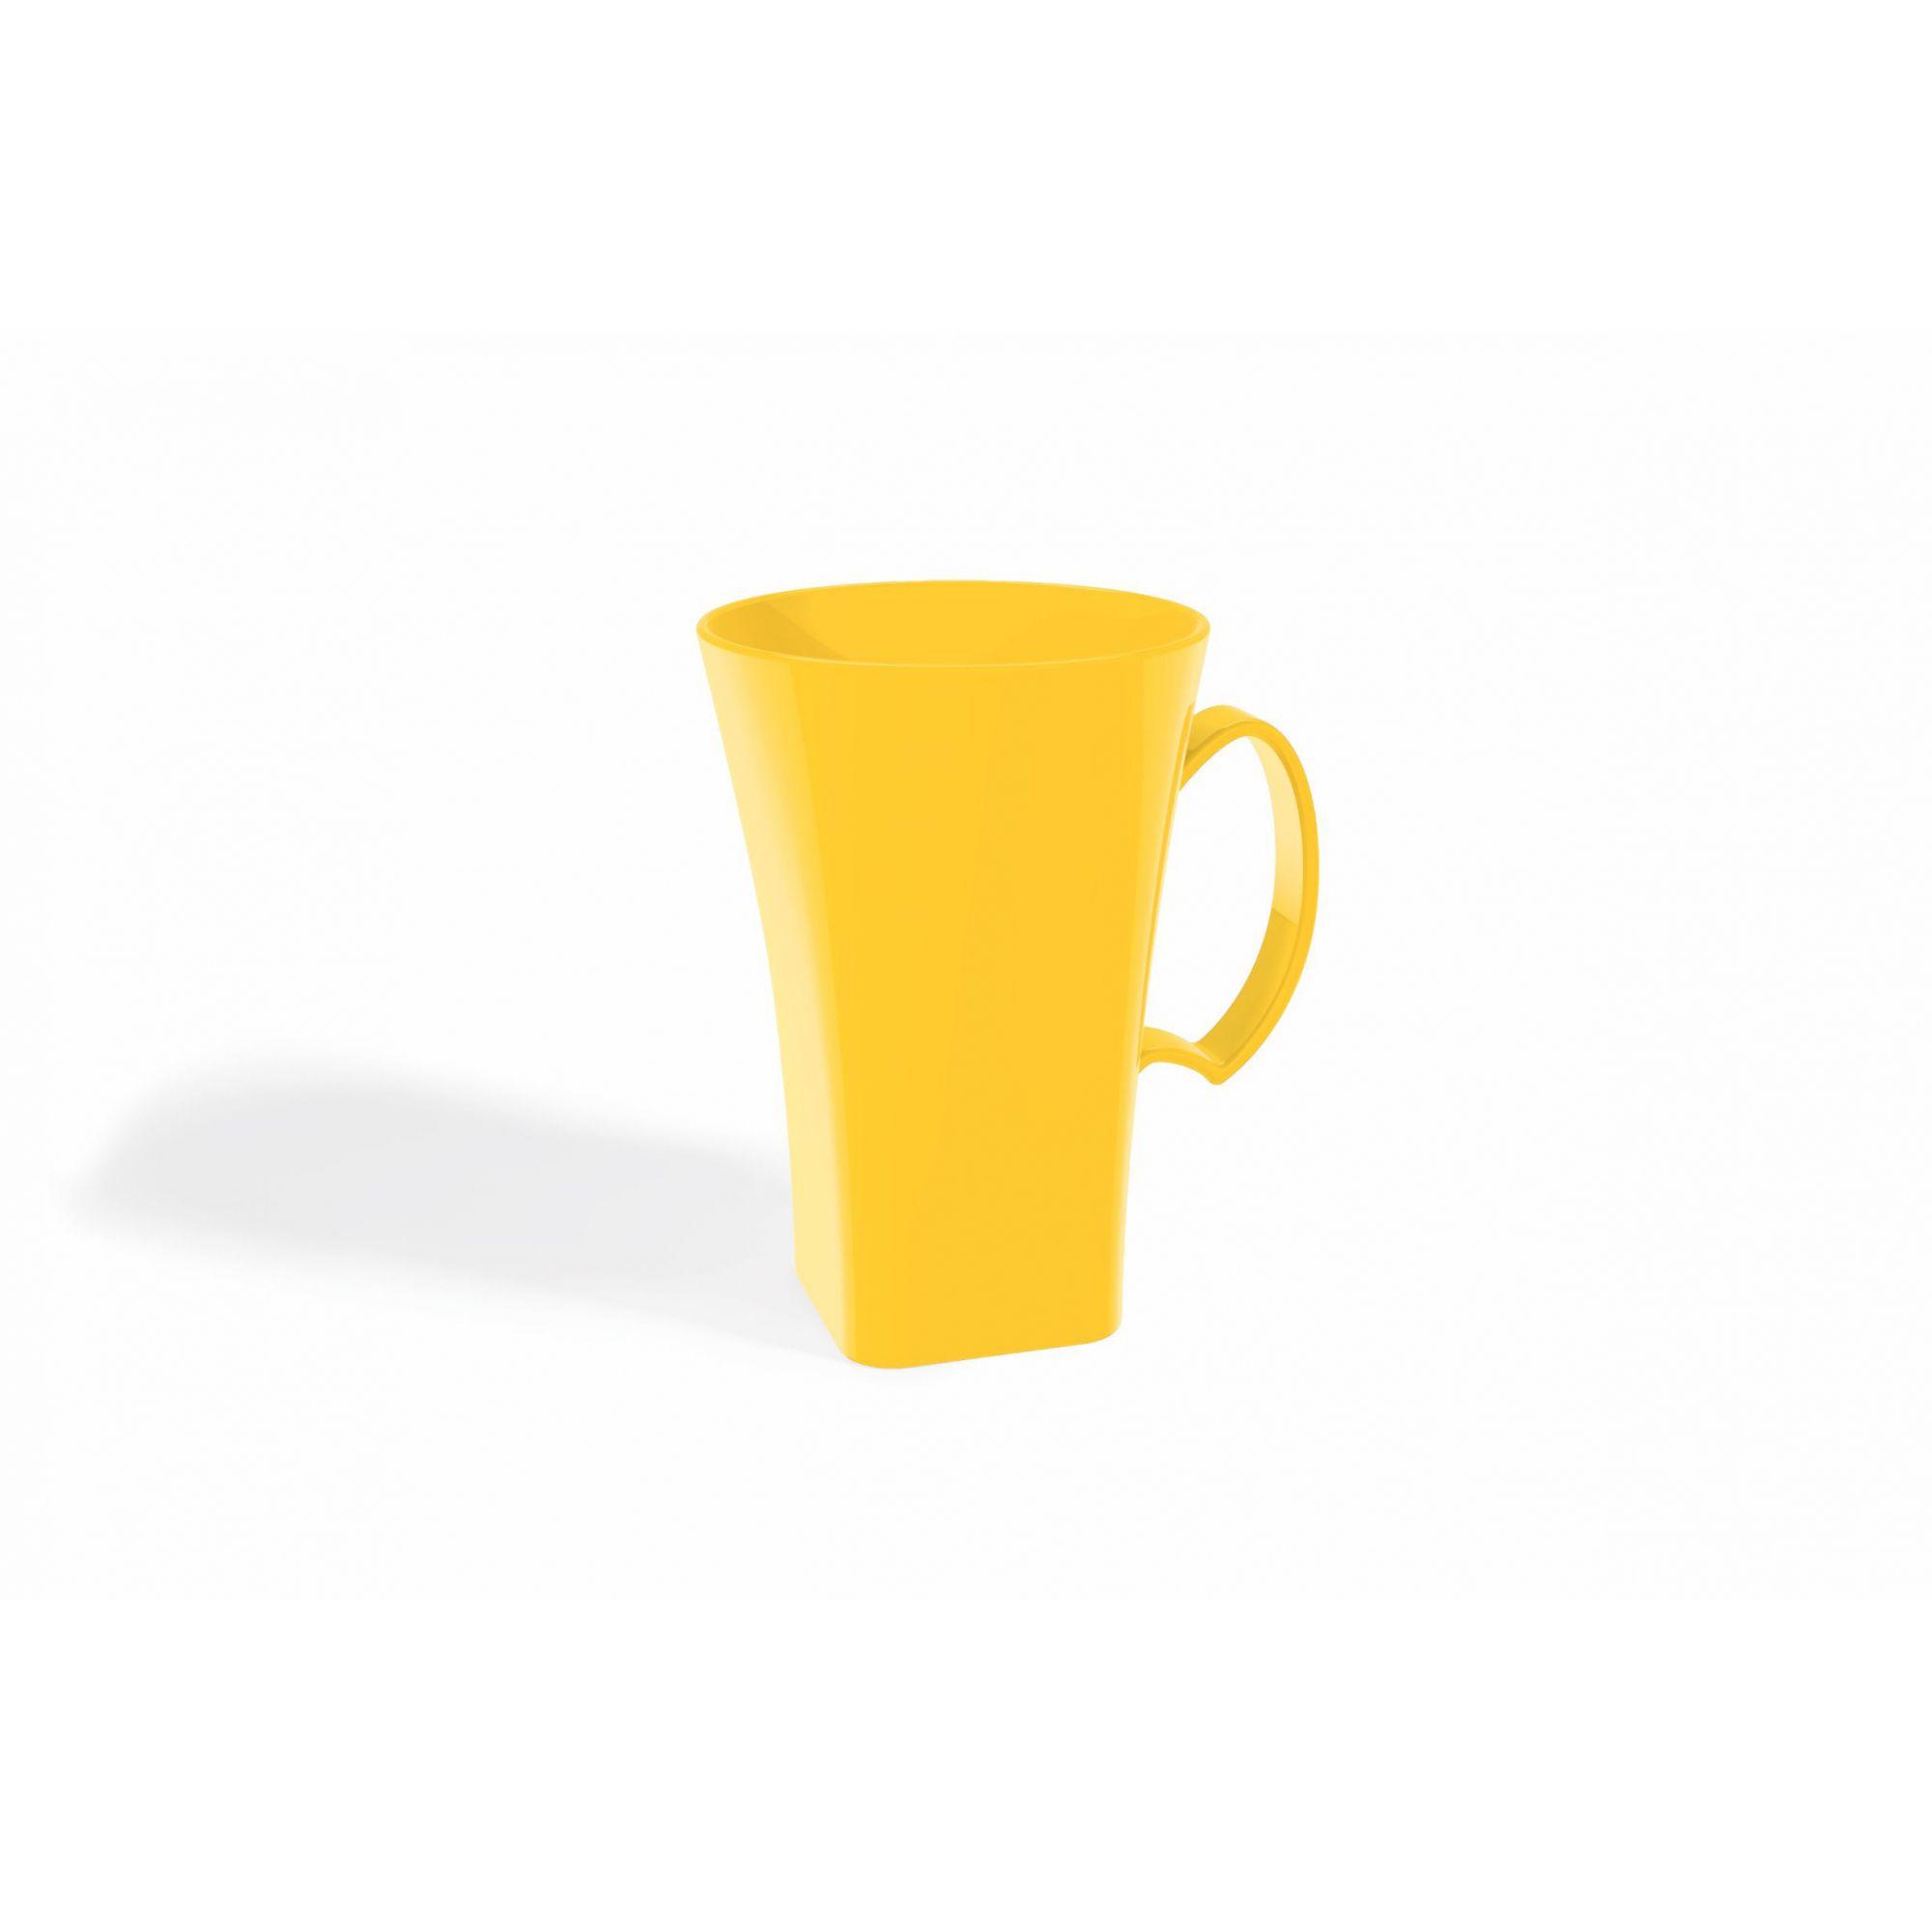 Kit 6 Canecas Capuccino 400ml Plástico Uz Utilidades Amarelo